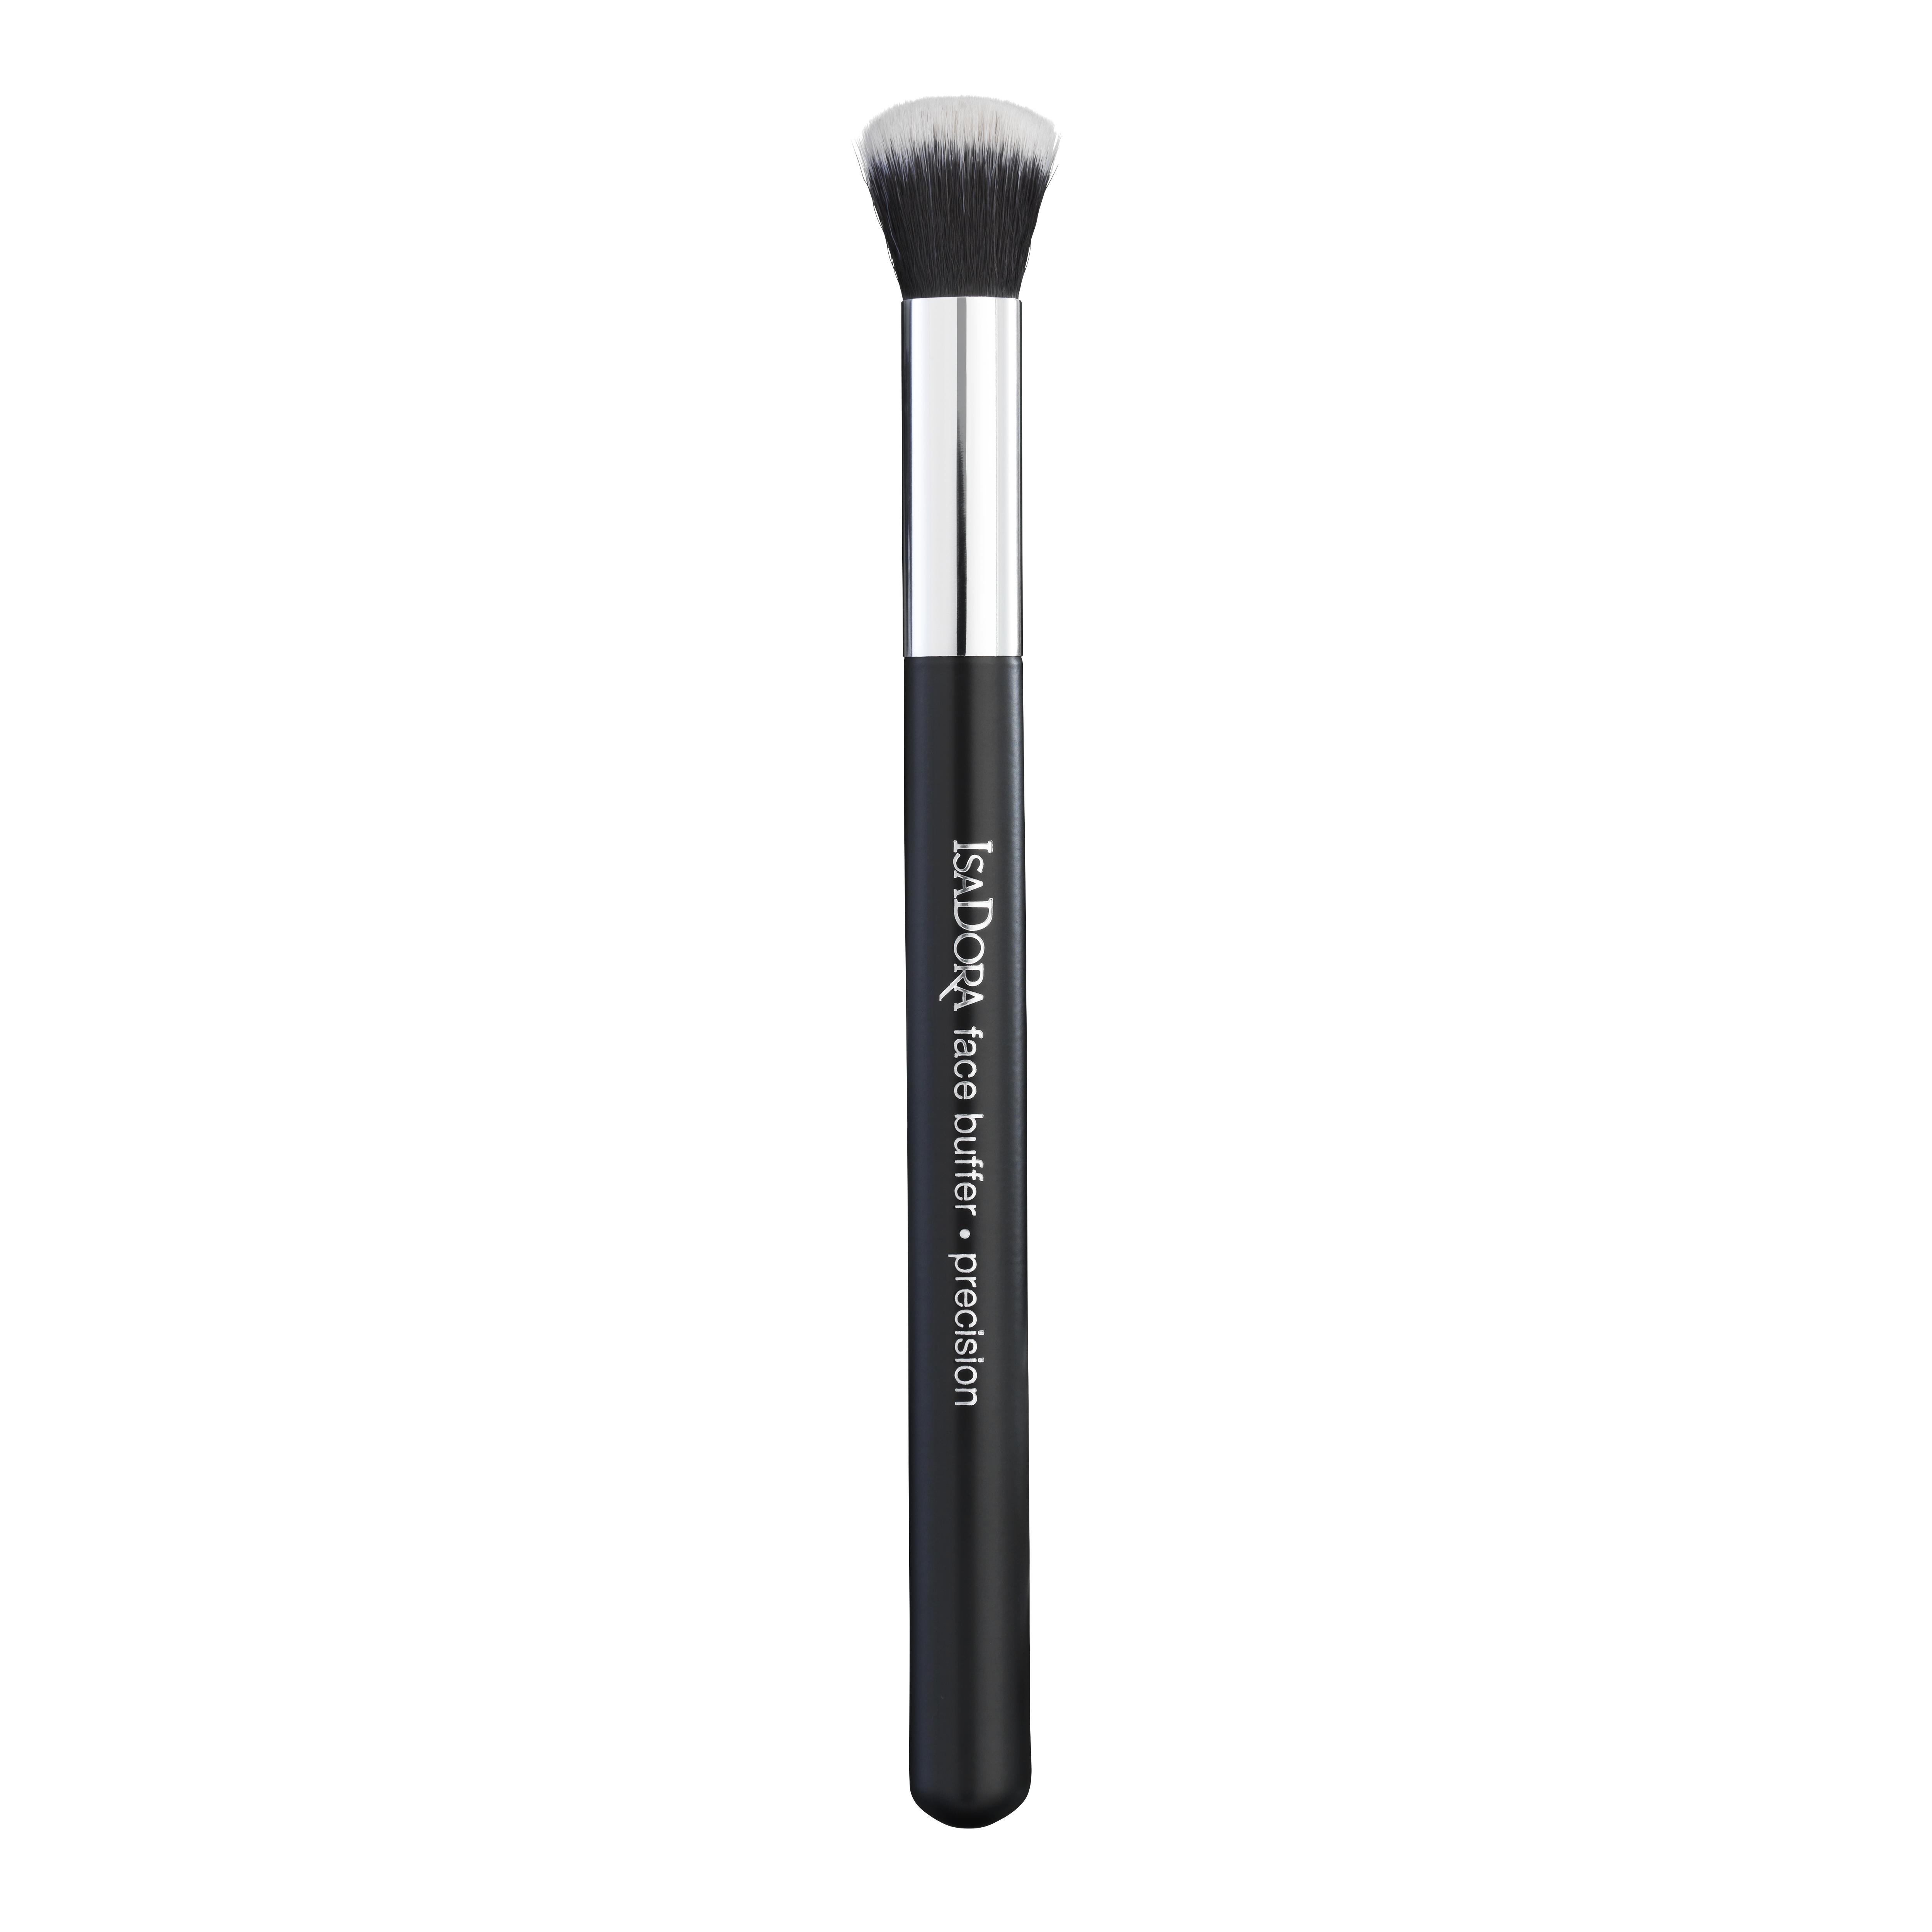 Face Buffer Brush Precision